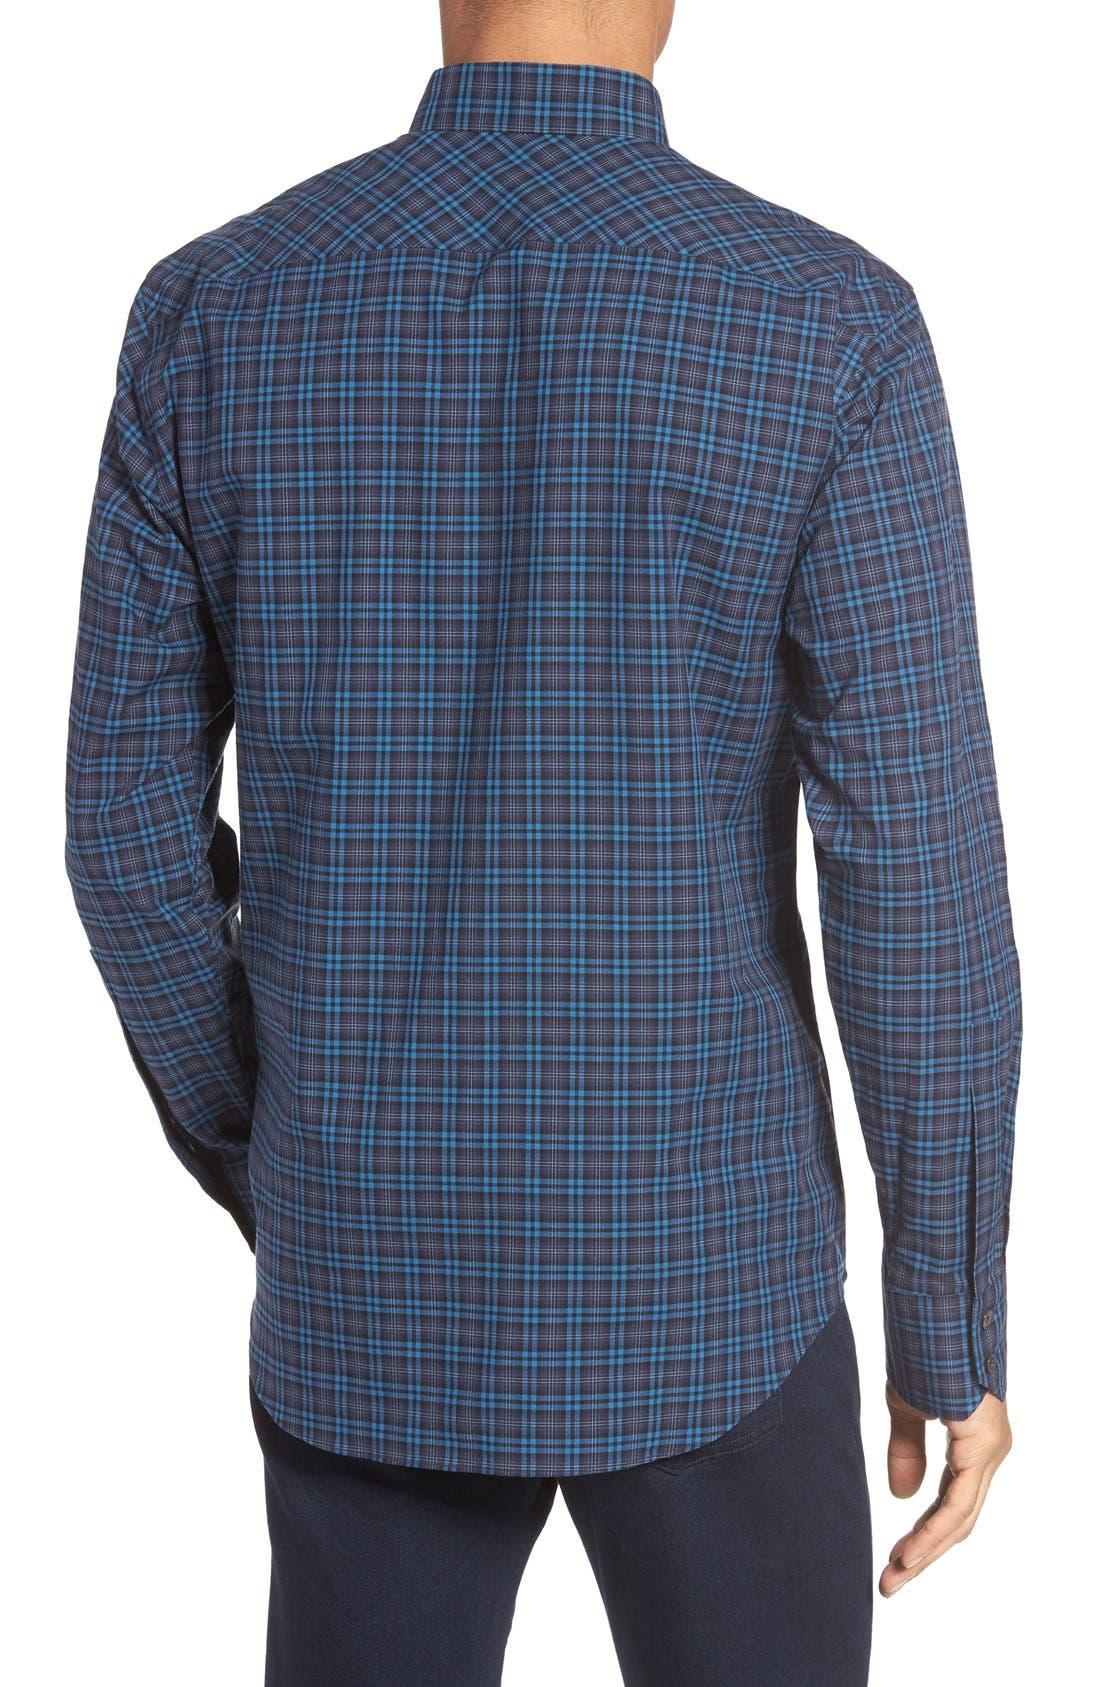 Alternate Image 2  - Zachary Prell Adler Trim Fit Plaid Sport Shirt